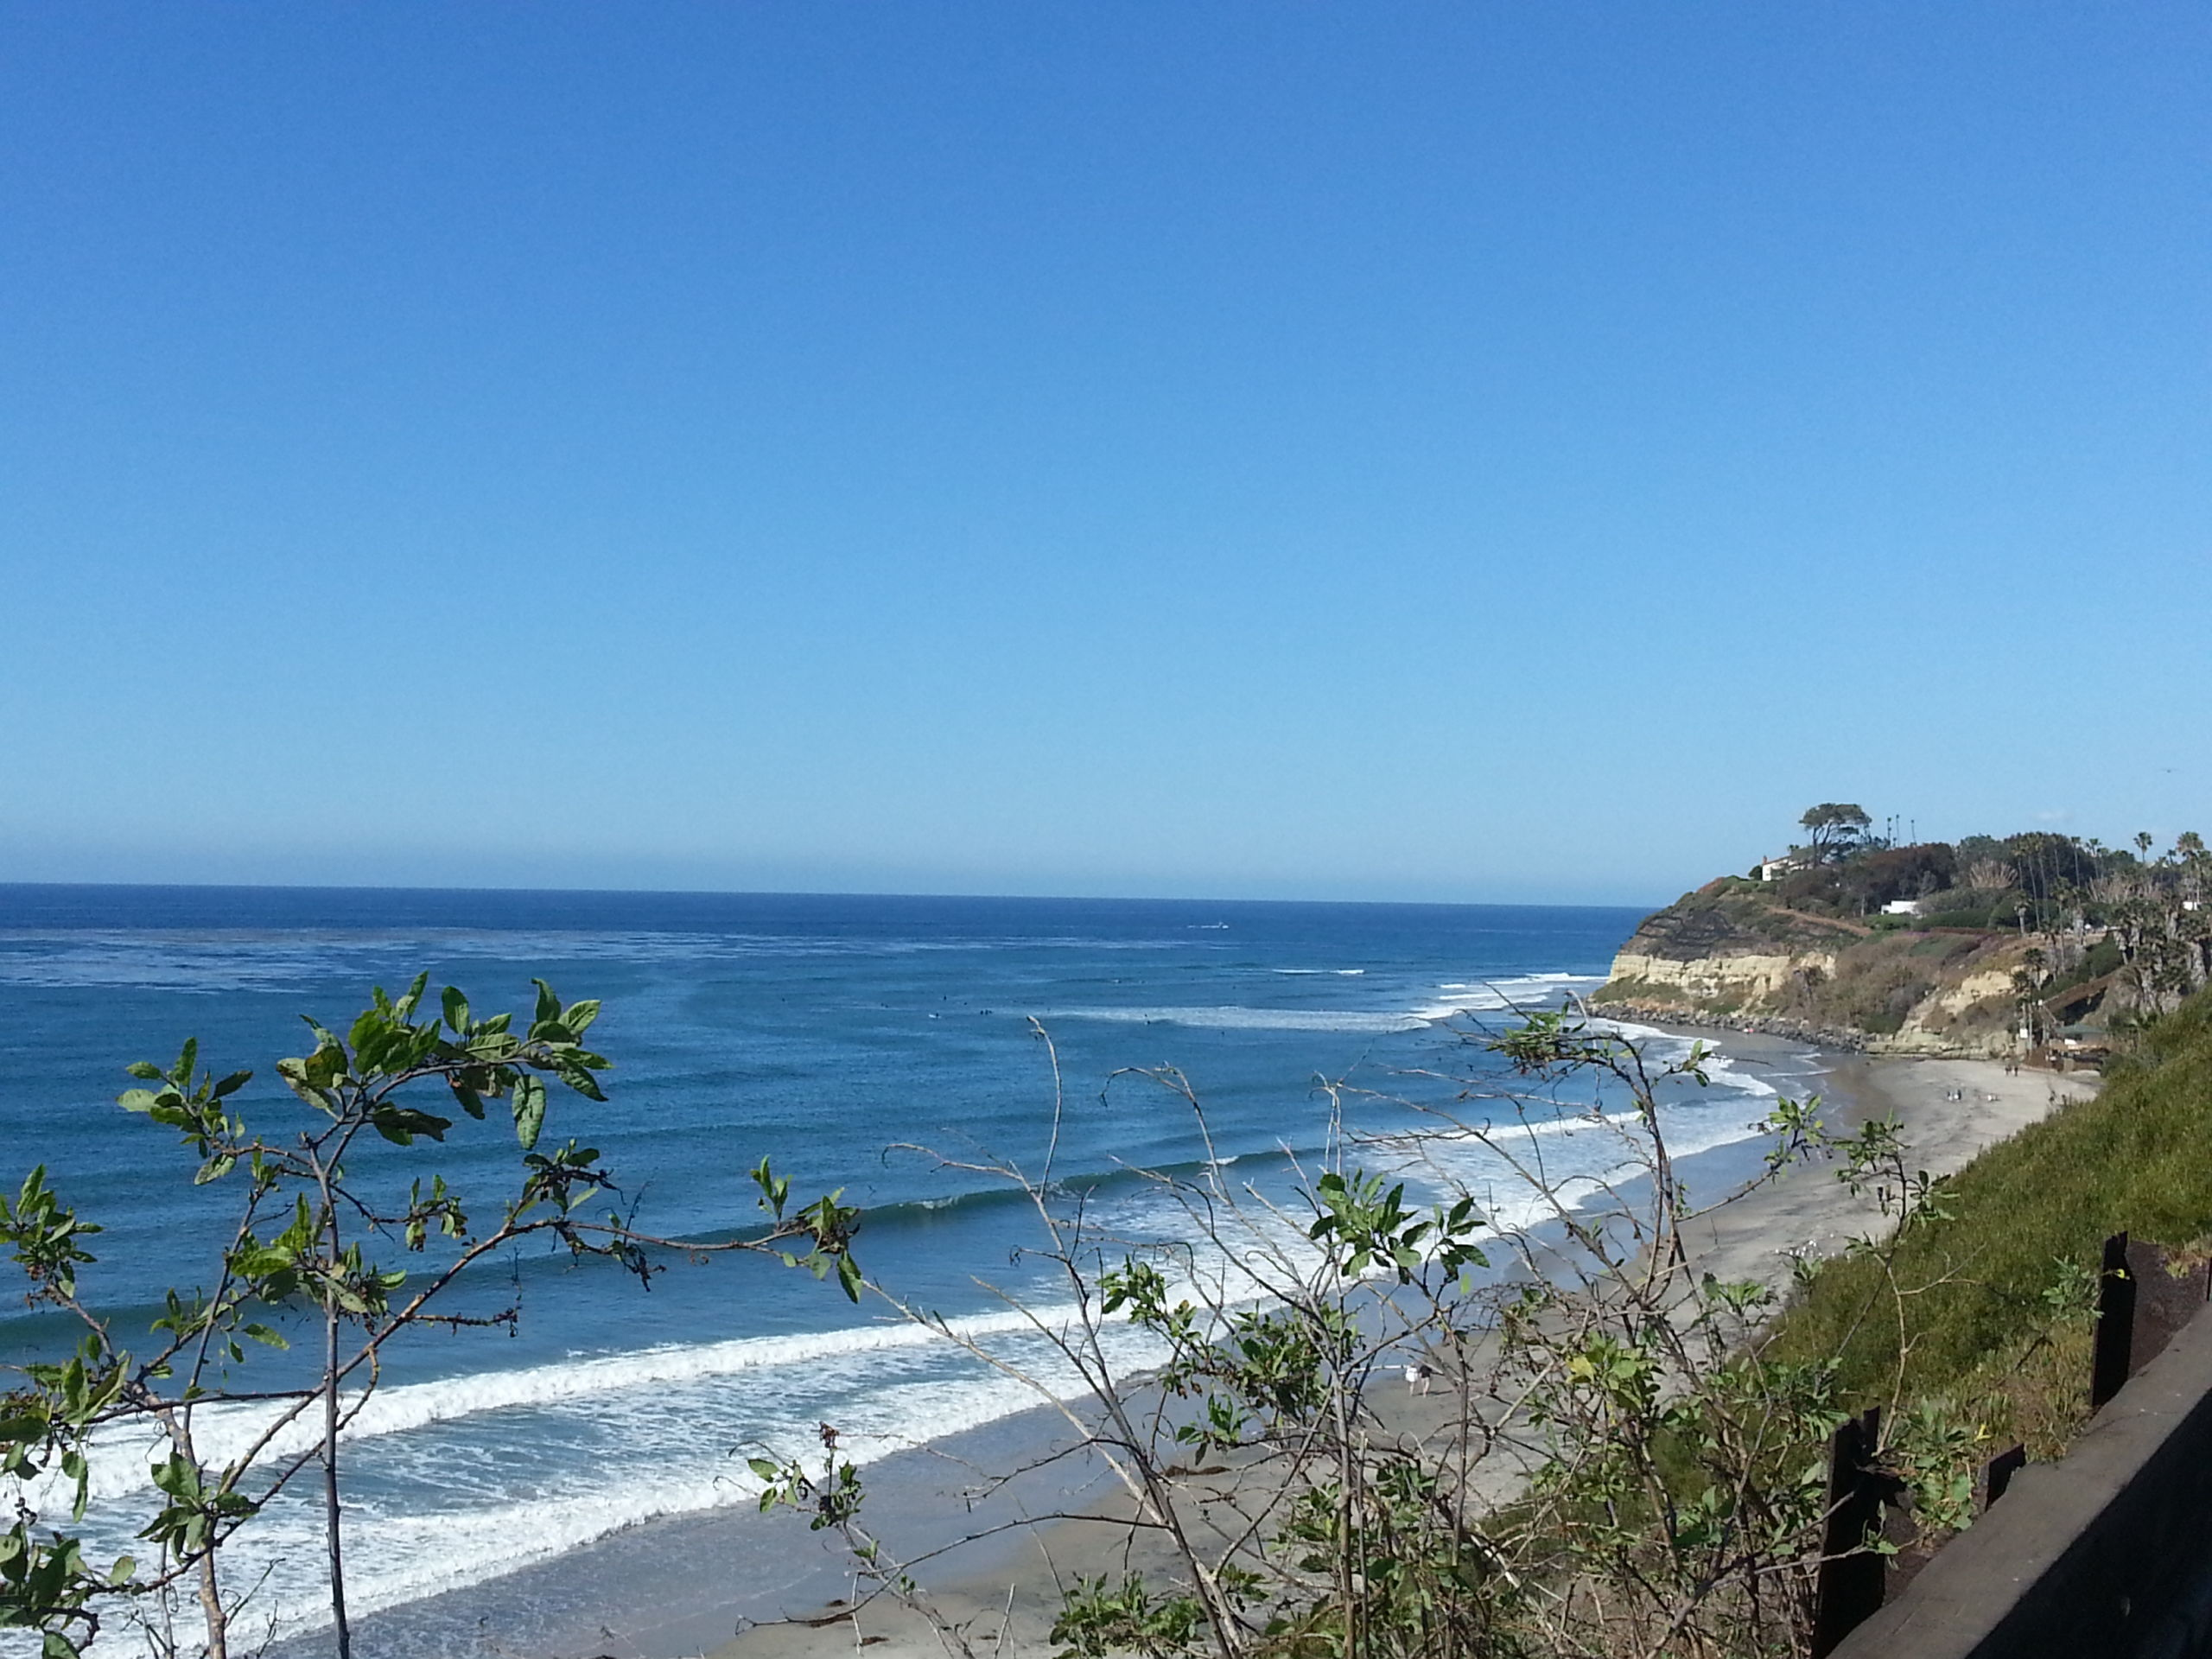 Encinitas Swami's Beach